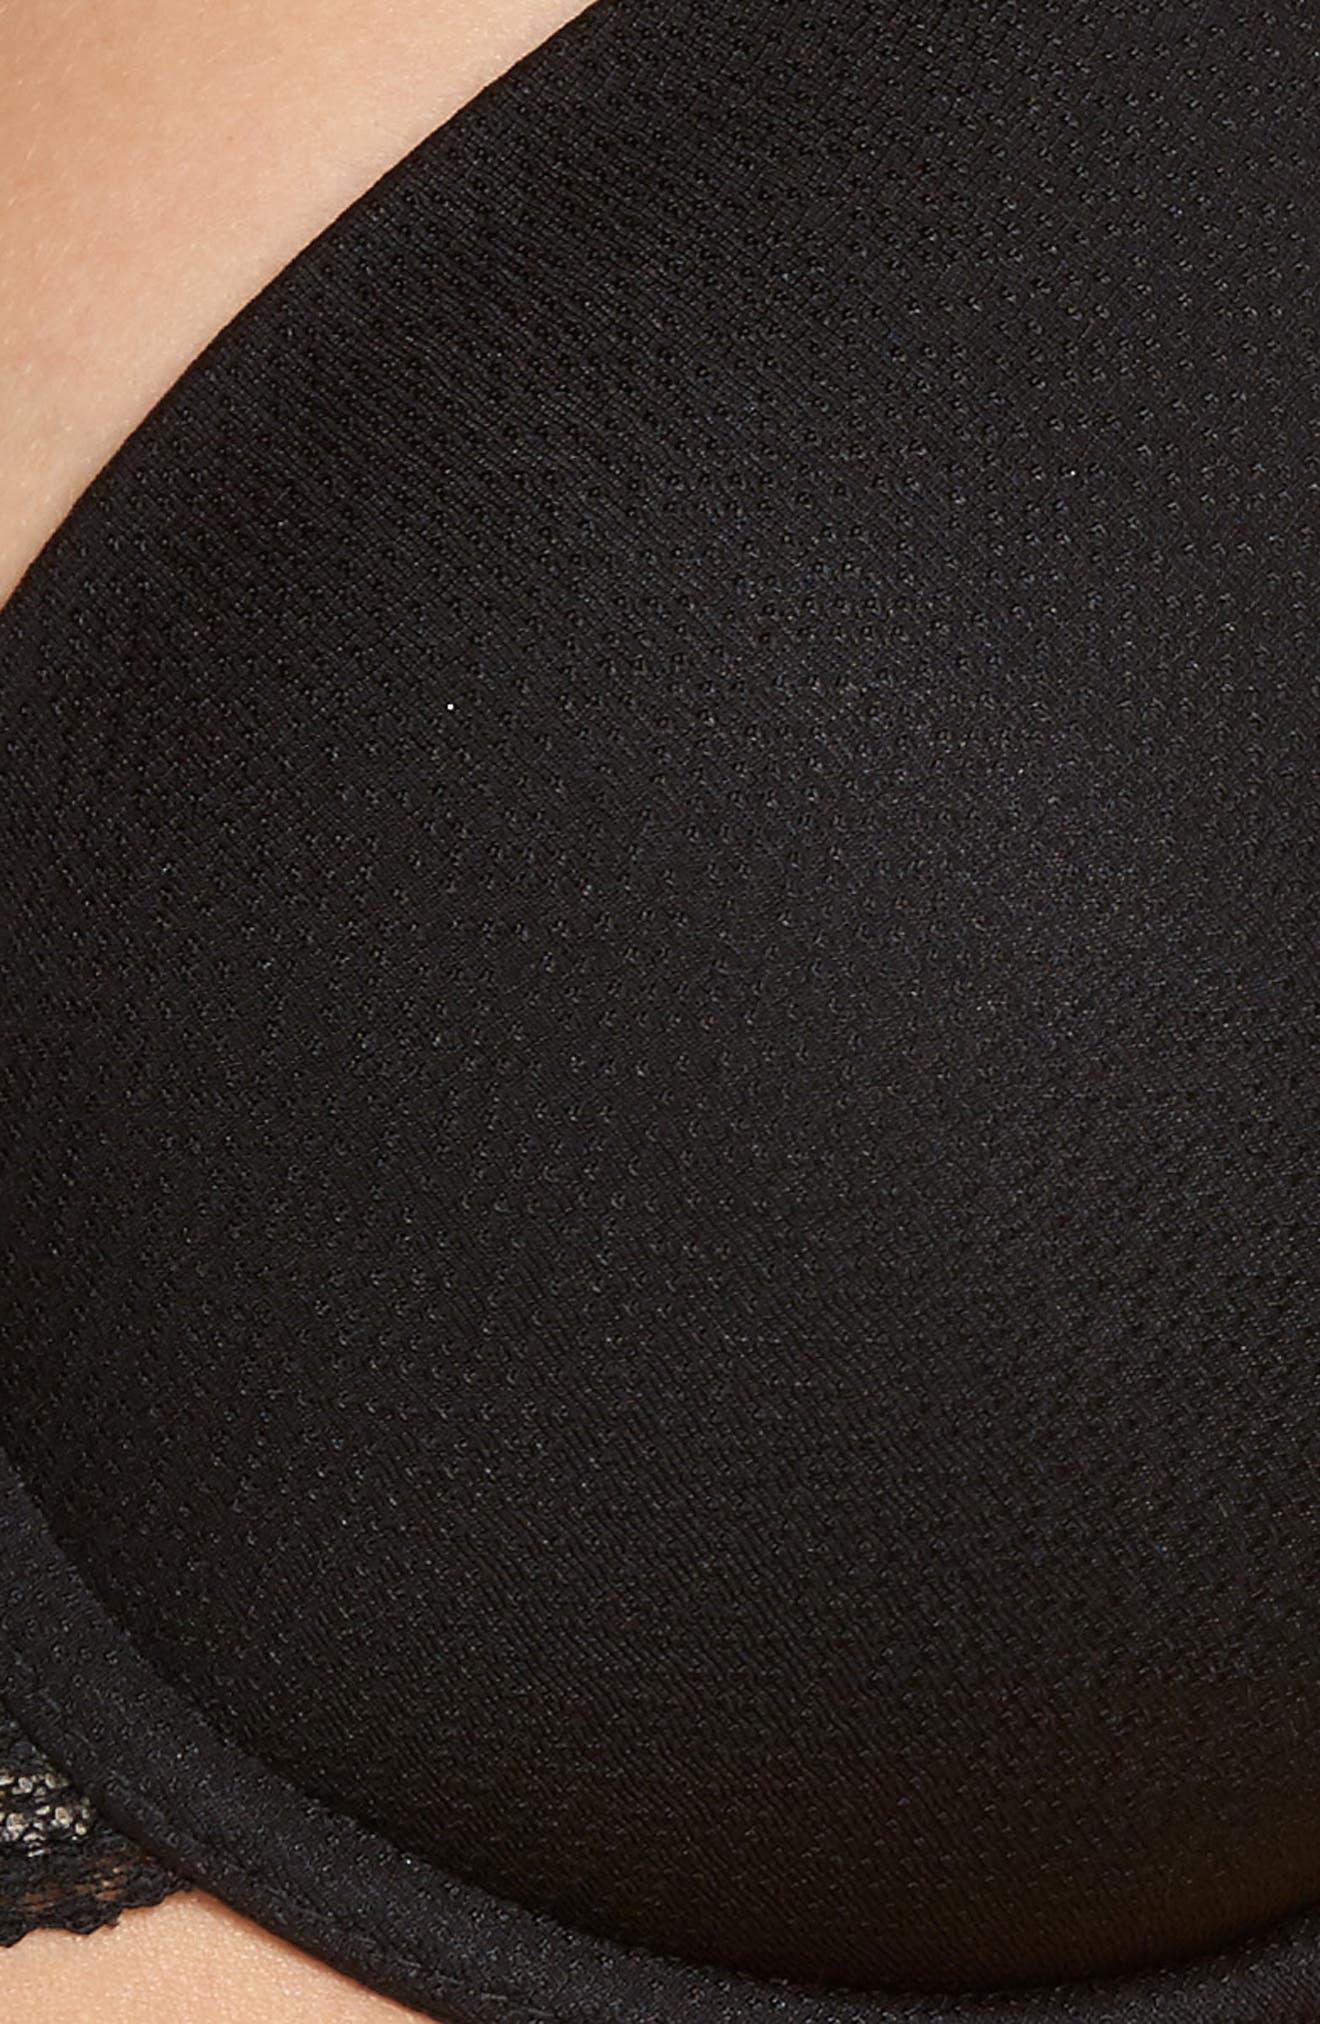 Top Tier Underwire T-Shirt Bra,                             Alternate thumbnail 6, color,                             BLACK